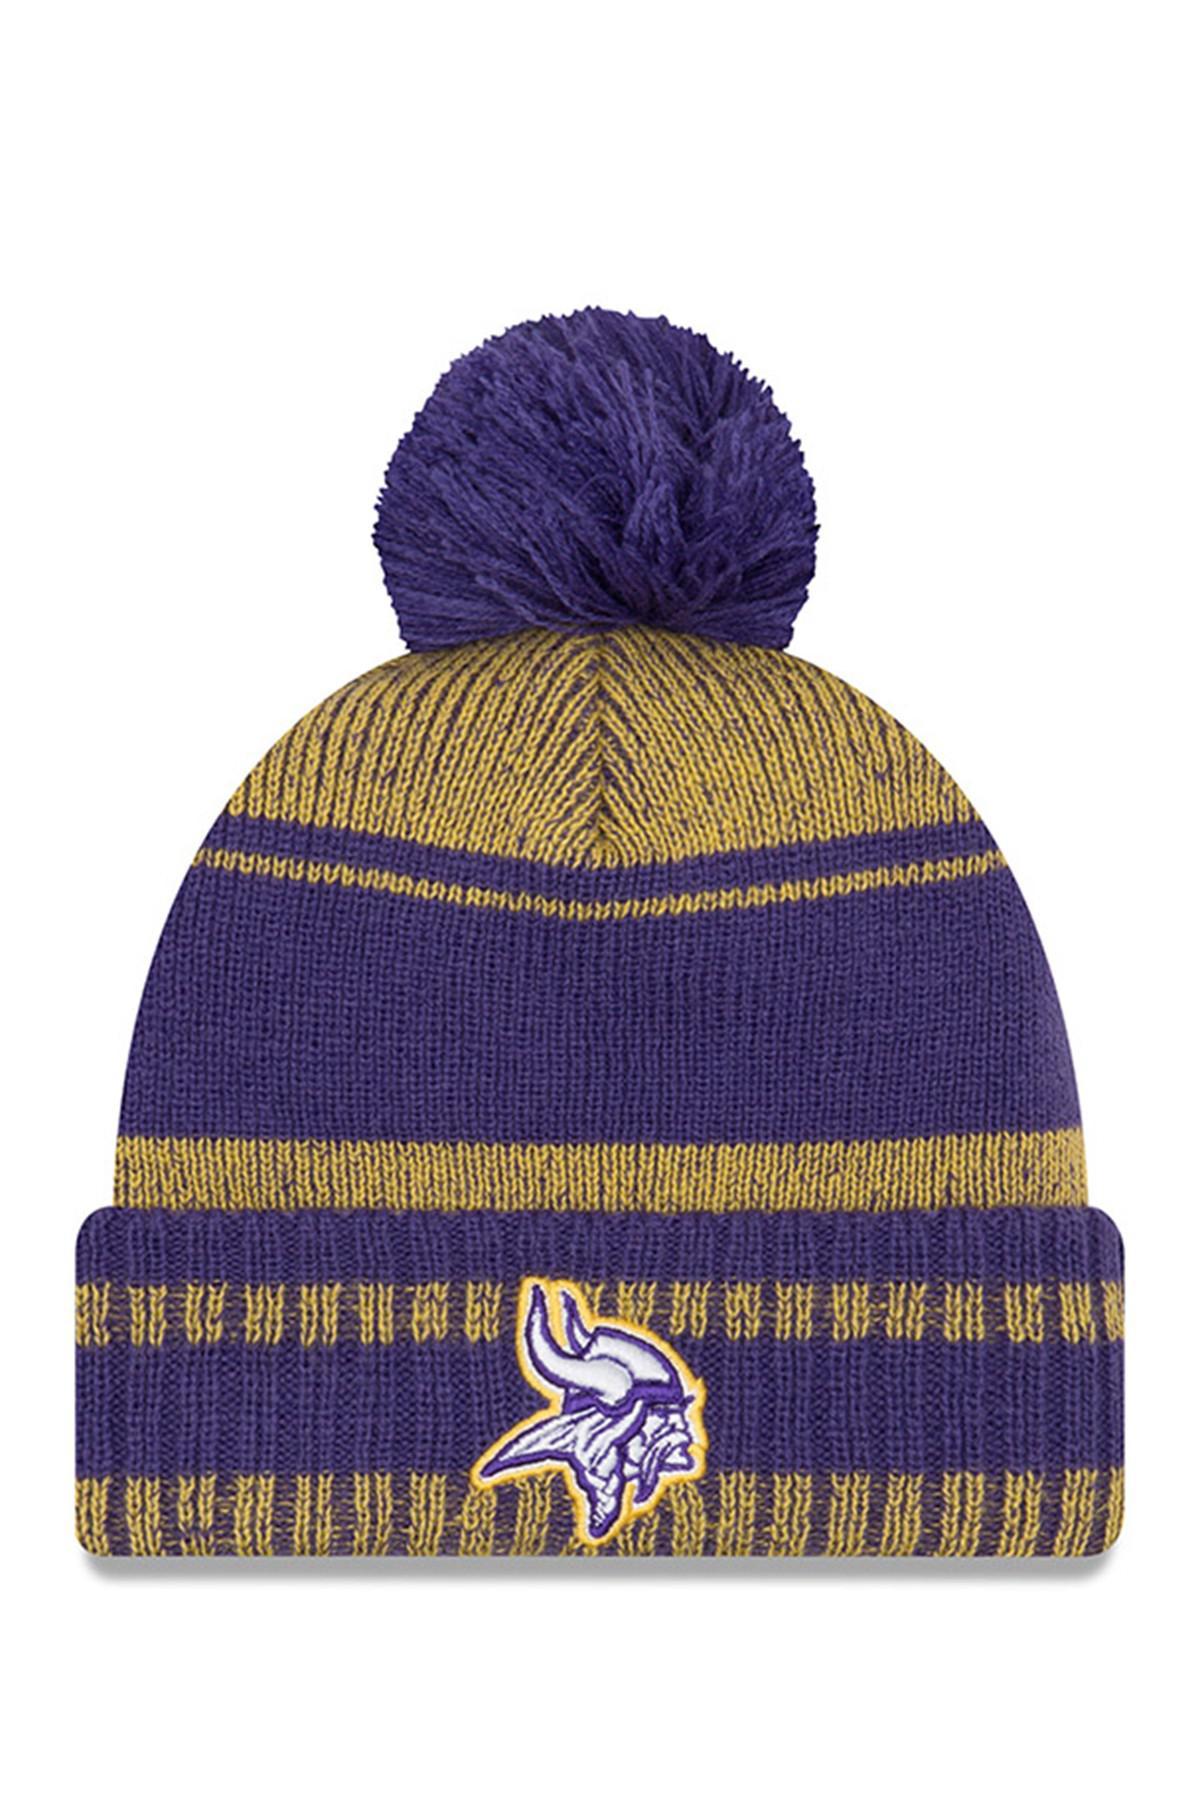 Lyst - KTZ Nfl Minnesota Vikings Glacial Pom Knit Beanie in Purple 415259457